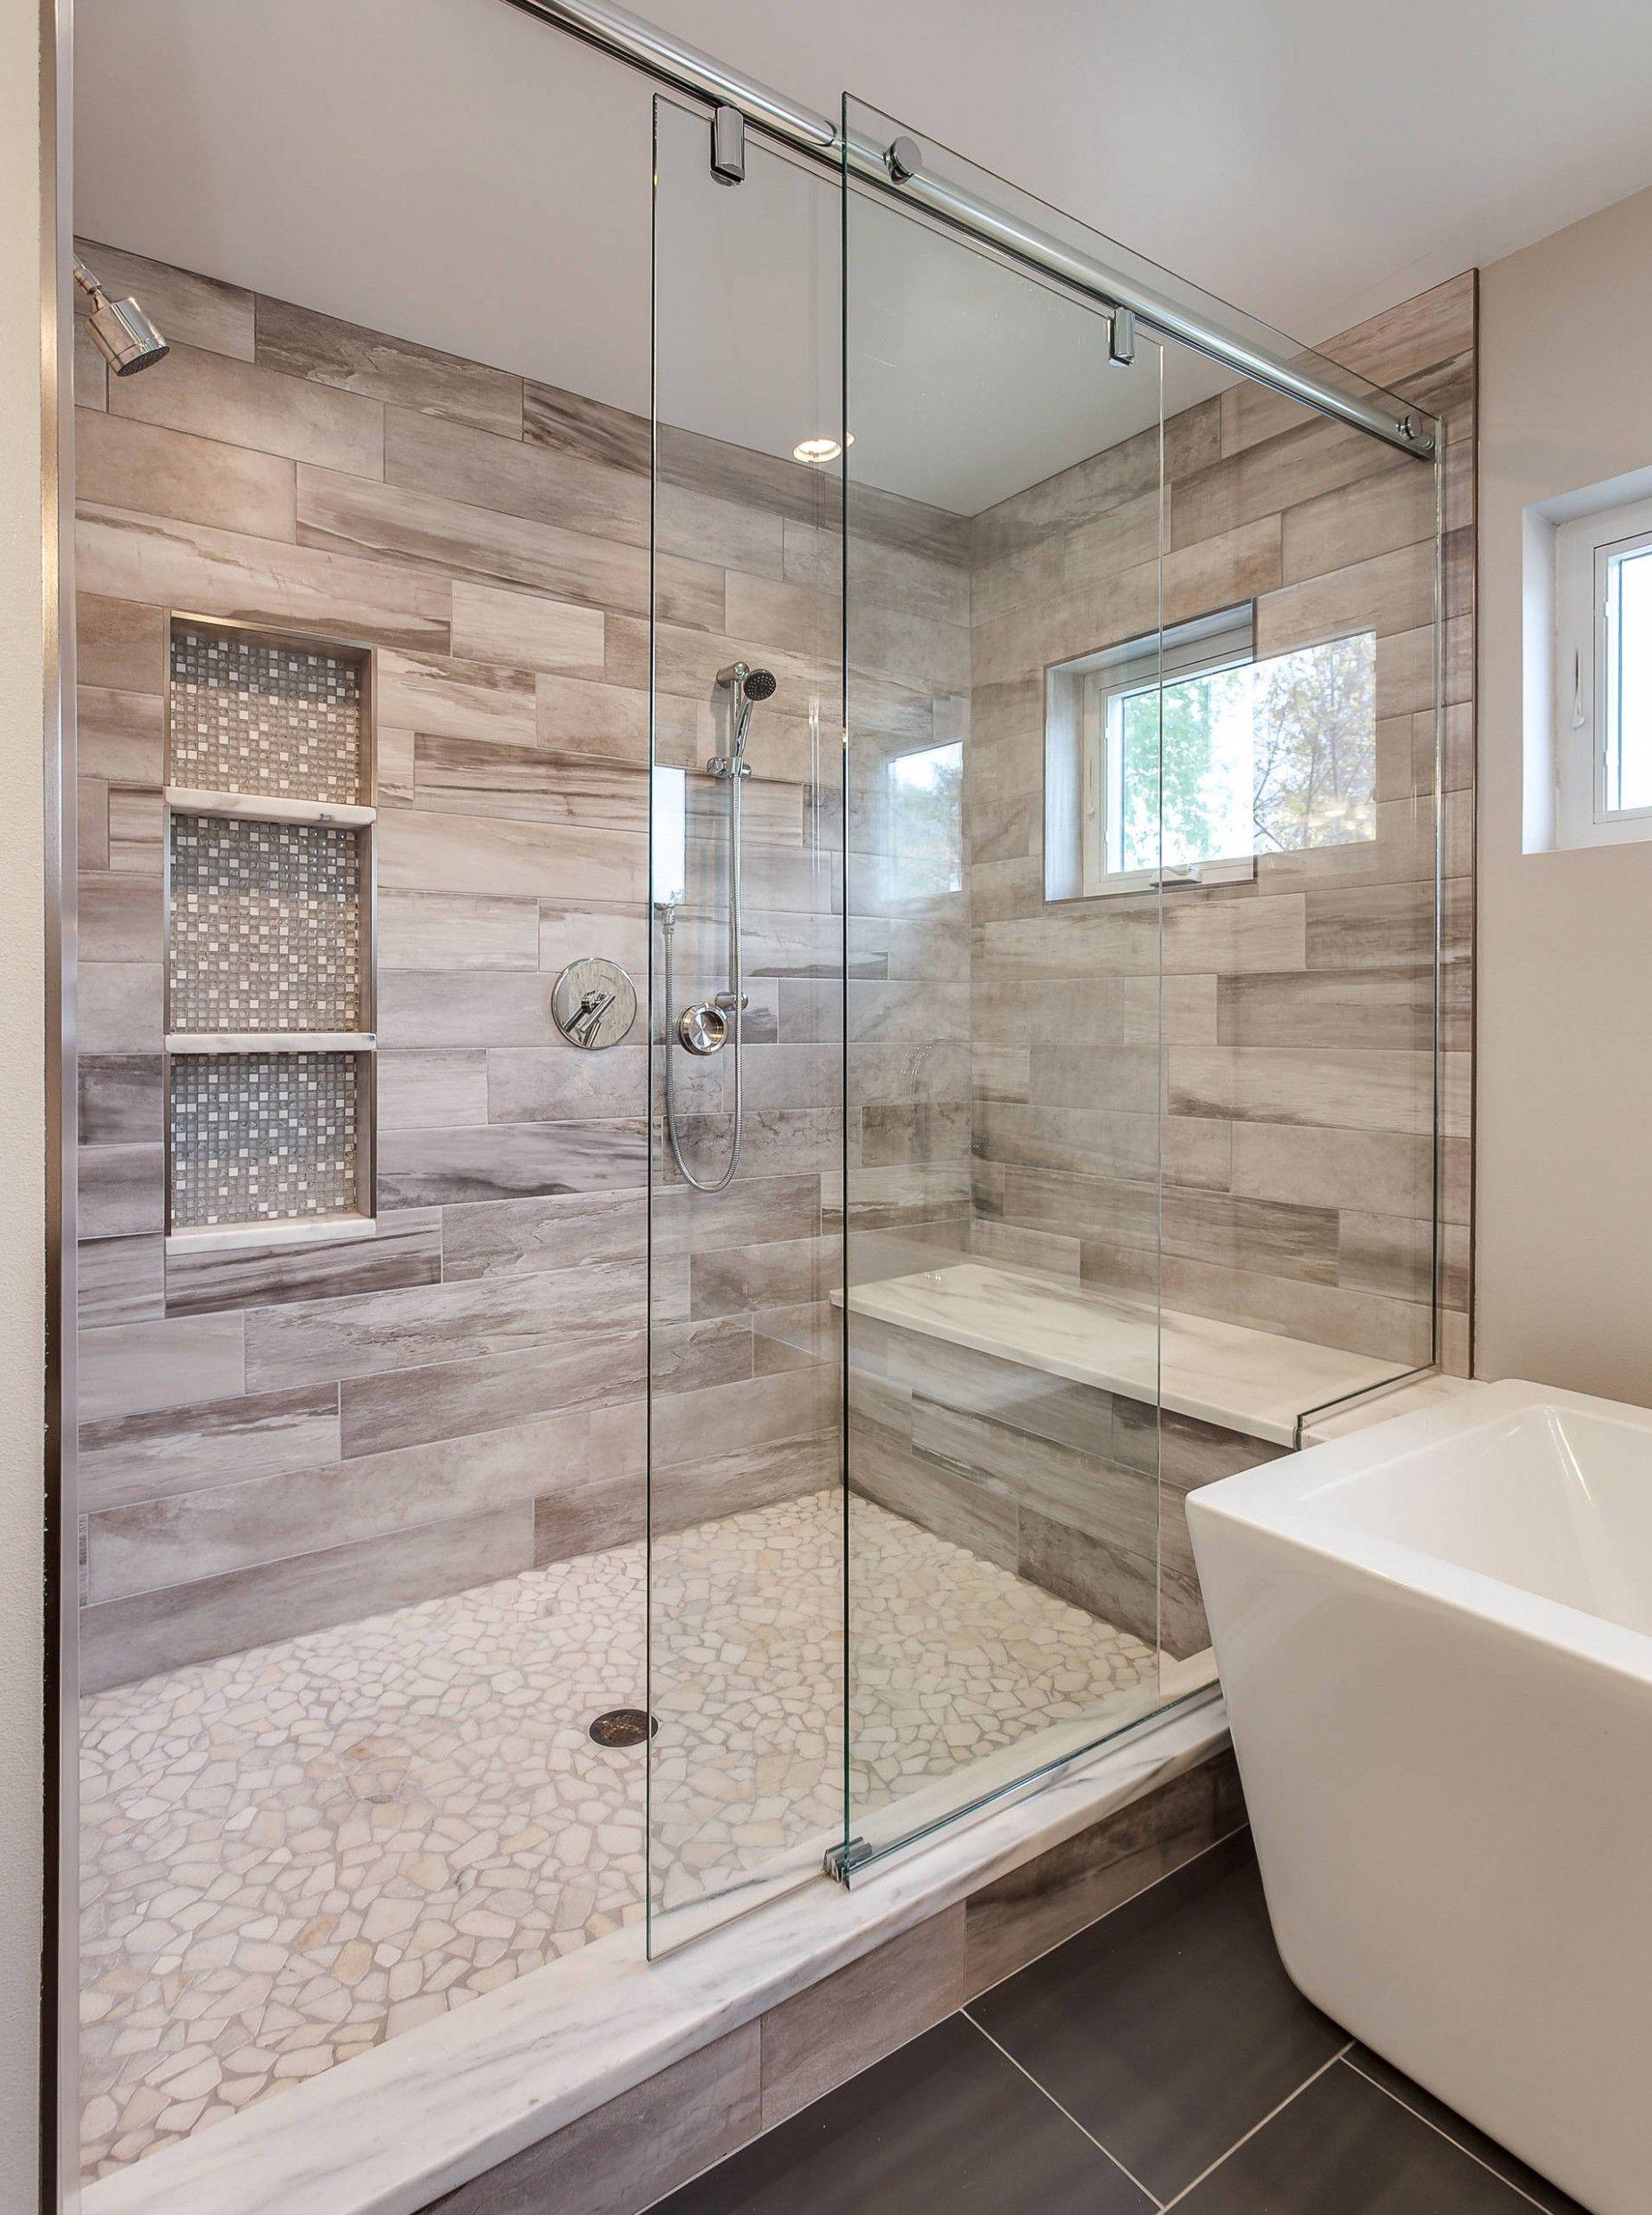 Bathroom Remodel Ideas Houzz Full Commodity Aboriginal Appear On Houzzhouzz Small Bathroom Ideas Home Design Ideas Bathroom Remodel In 2020 Bathroom Interior Design Bathroom Interior Master Bathroom Shower